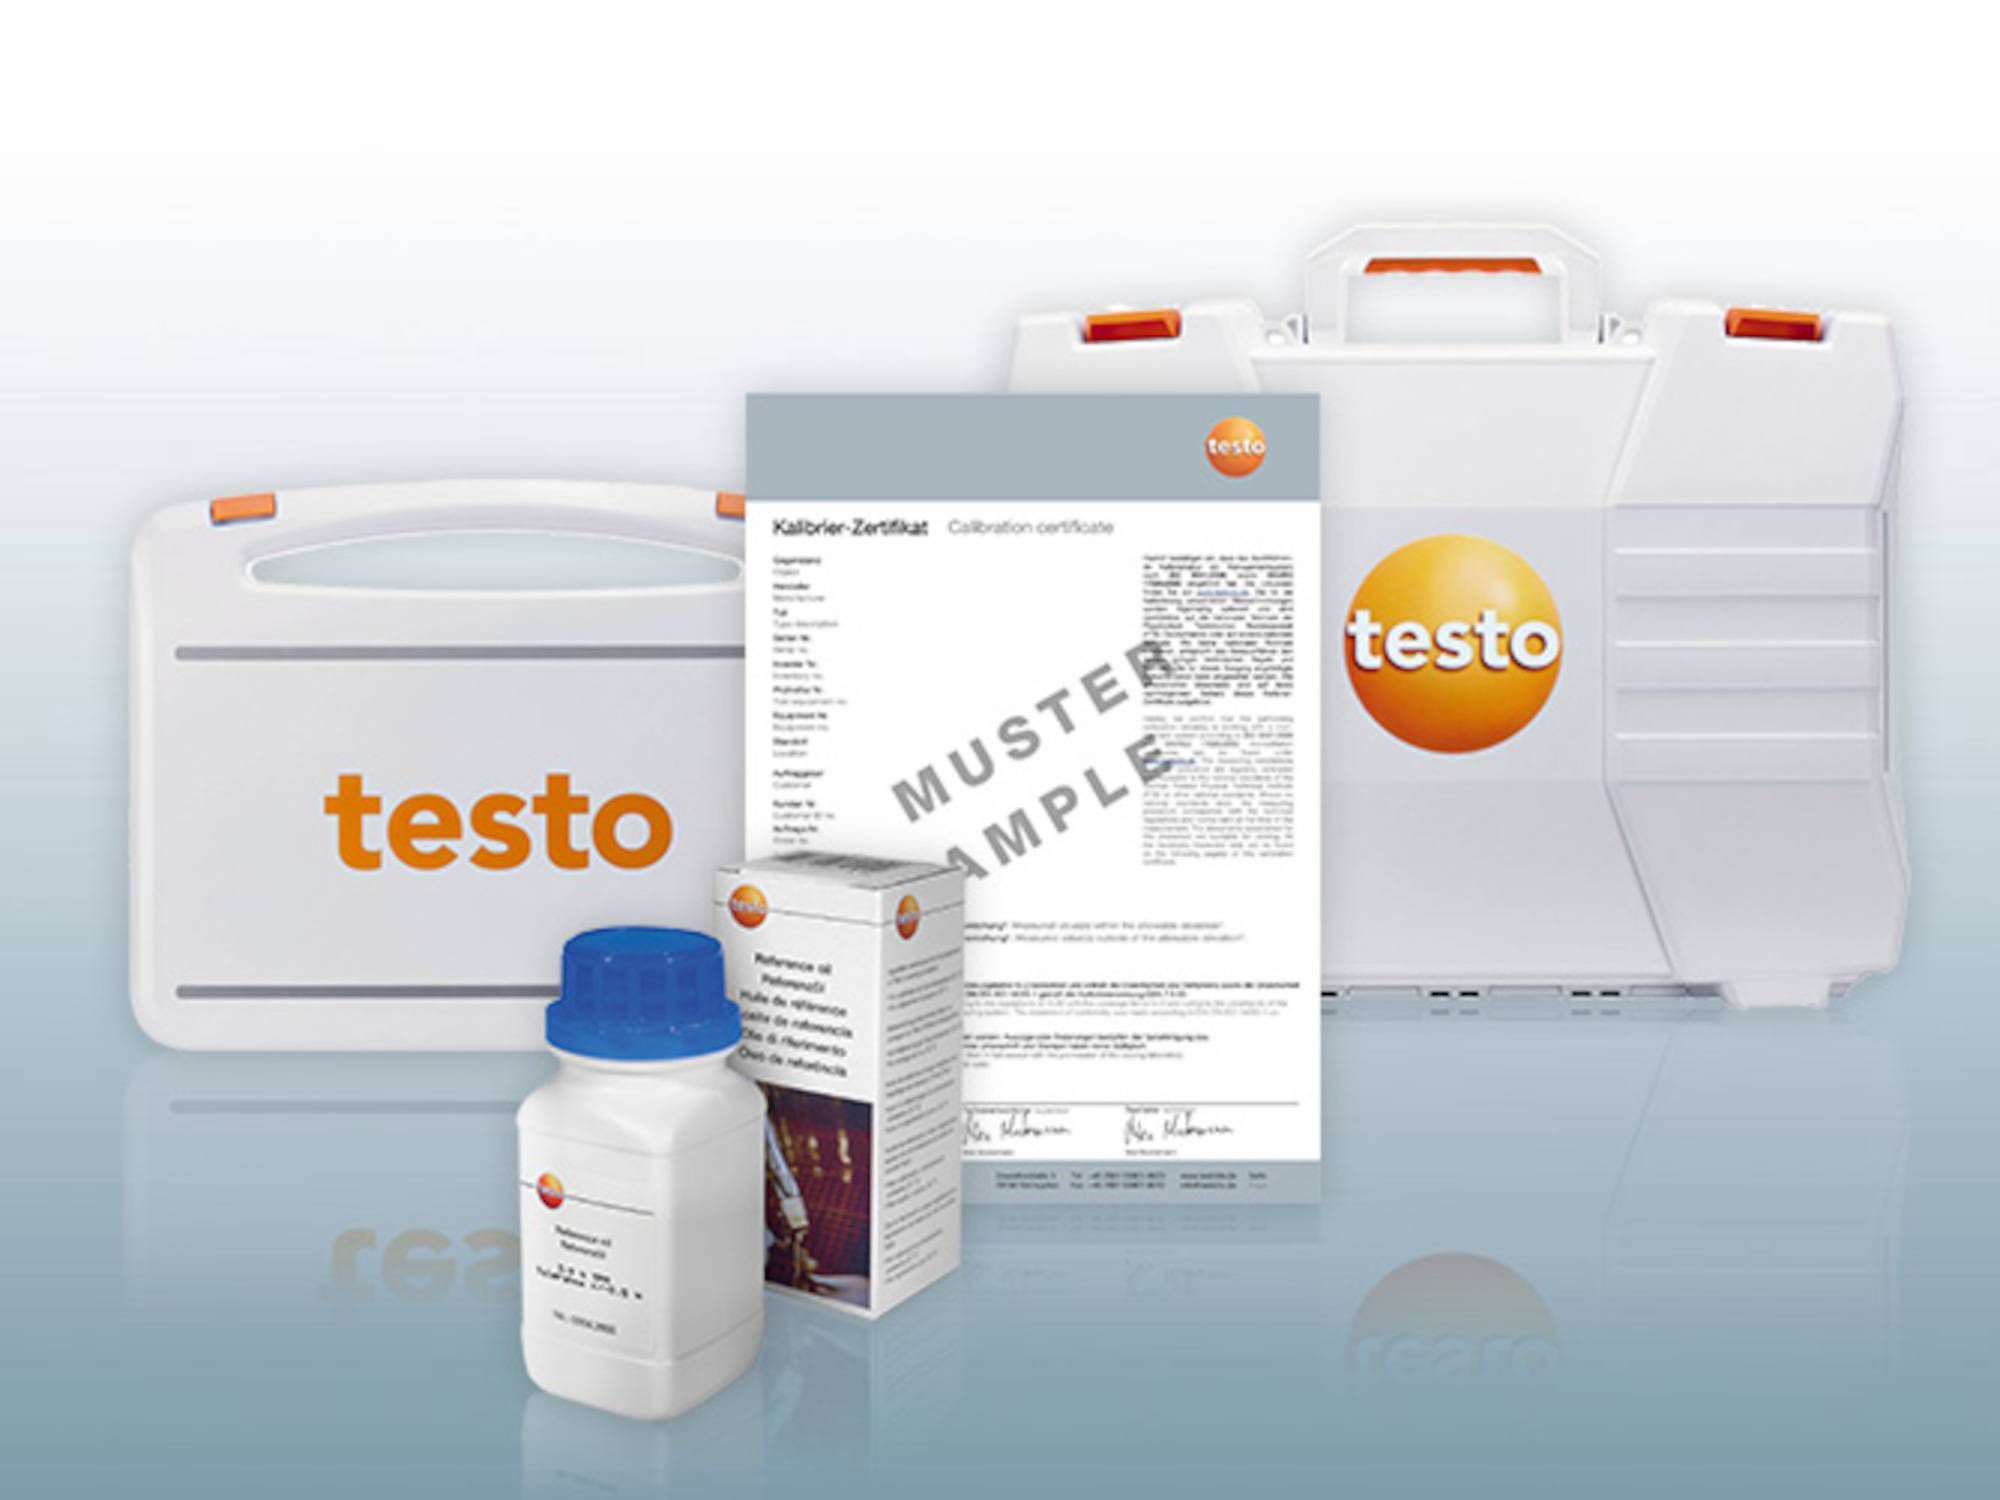 testo270煎炸油品质检测仪附件标定油